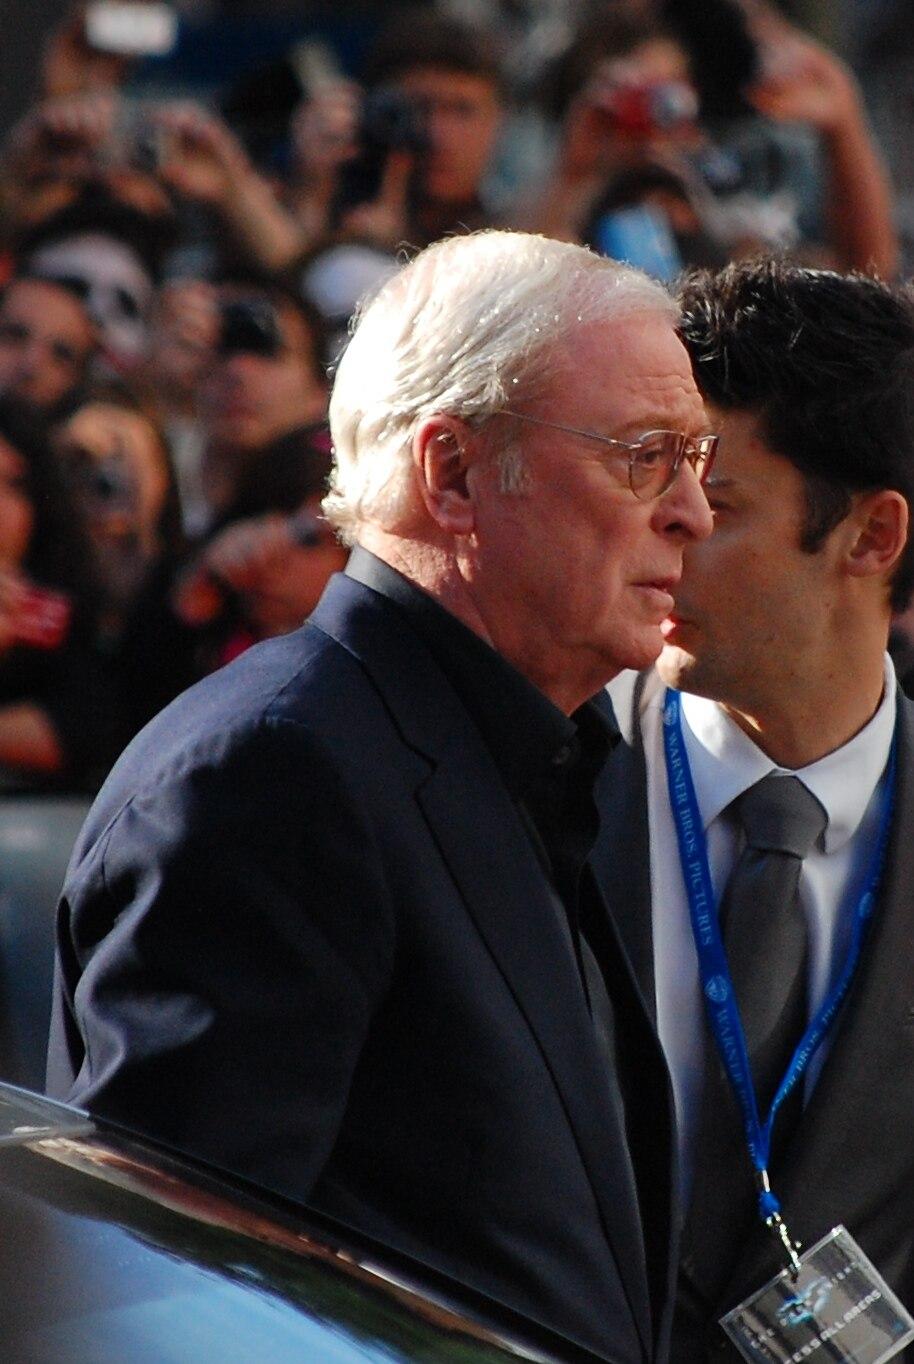 The Dark Knight European Premiere - Michael Caine